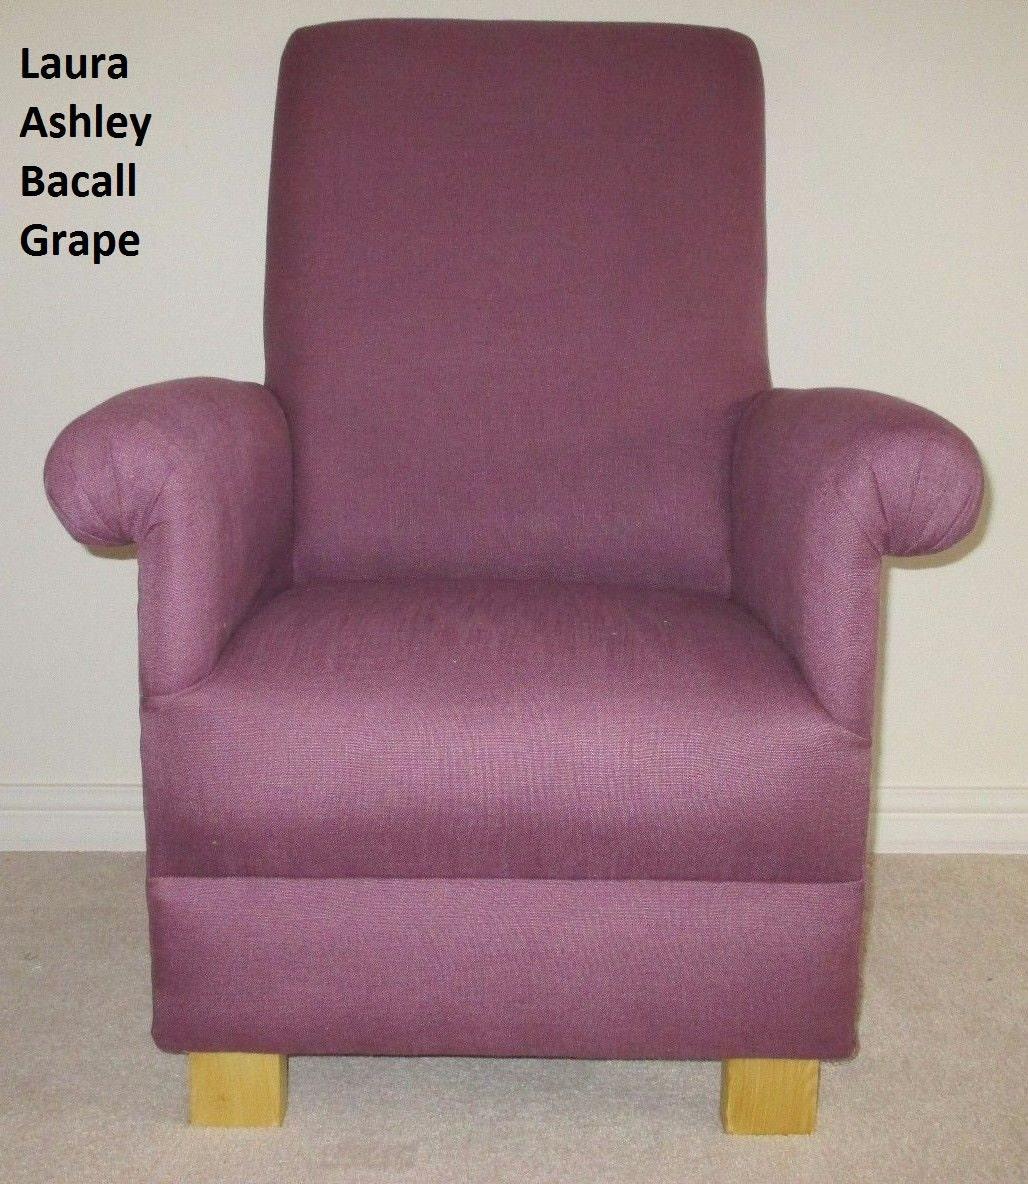 Laura Ashley Bacall Grape Fabric Adult Chair Purple Lilac Mauve Armchair Bedroom Nursery Occasional Bespoke